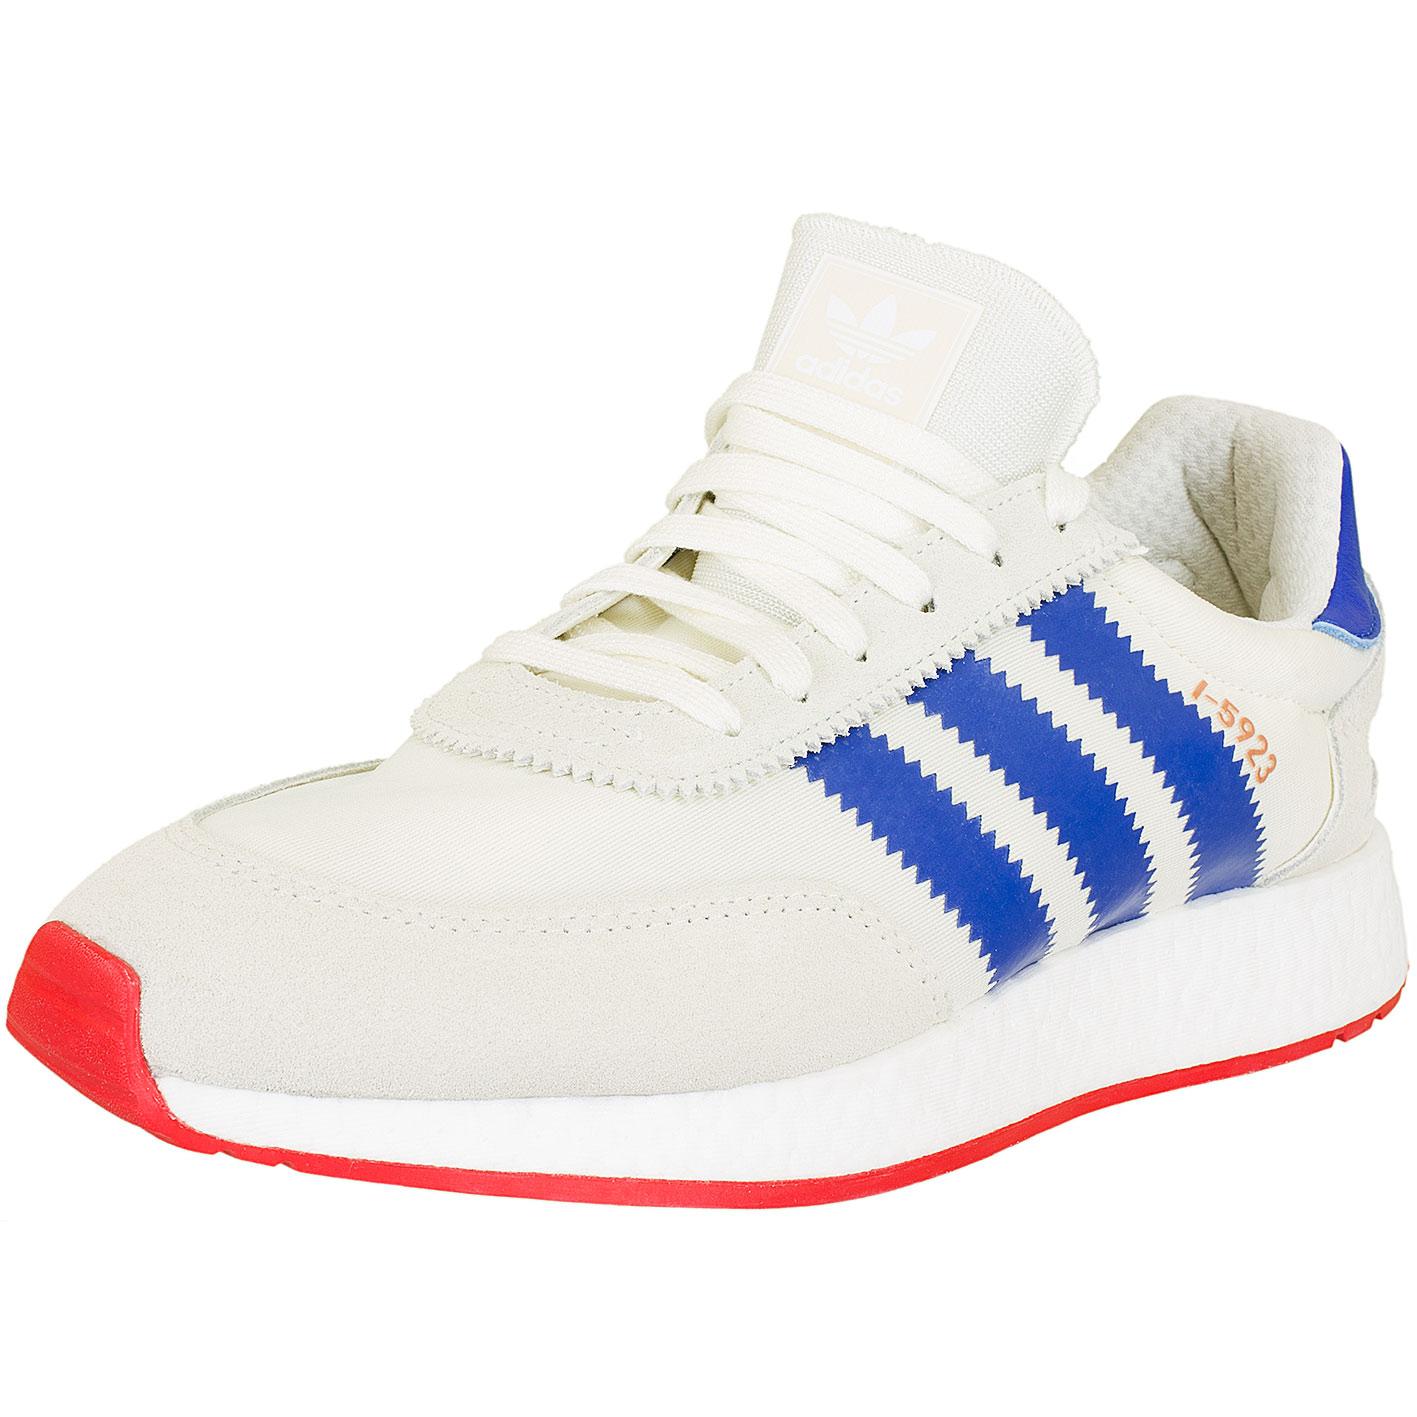 ☆ Adidas Originals Sneaker I 5923 weißblaurot hier